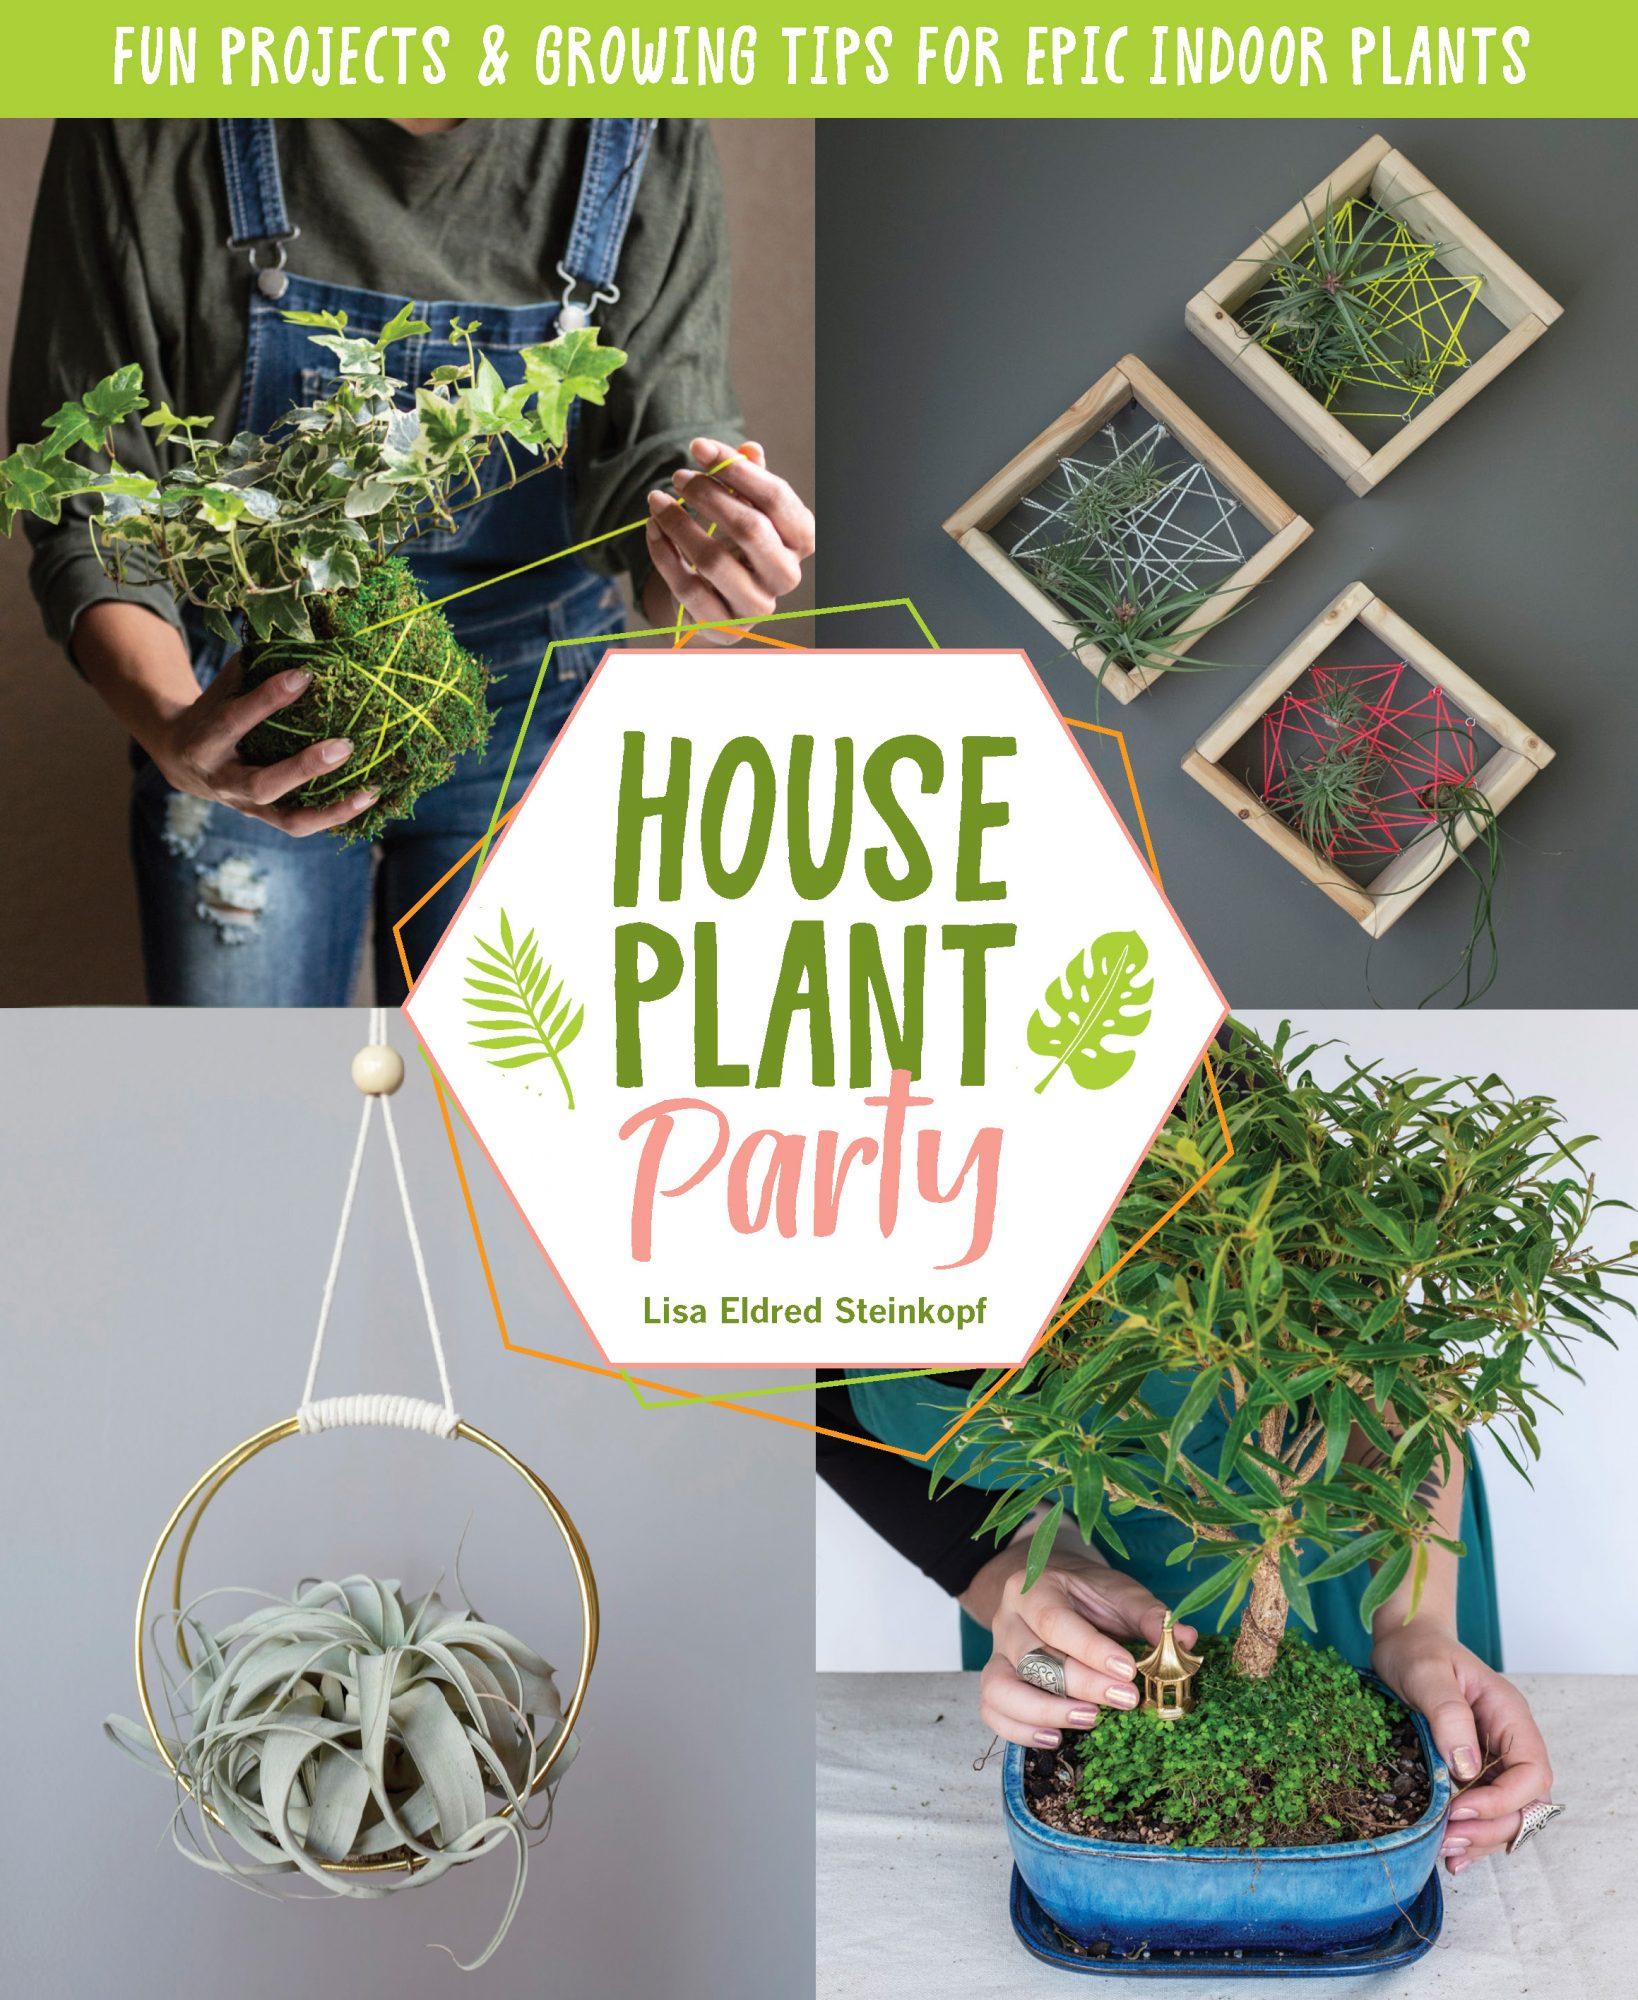 How to propagate houseplants